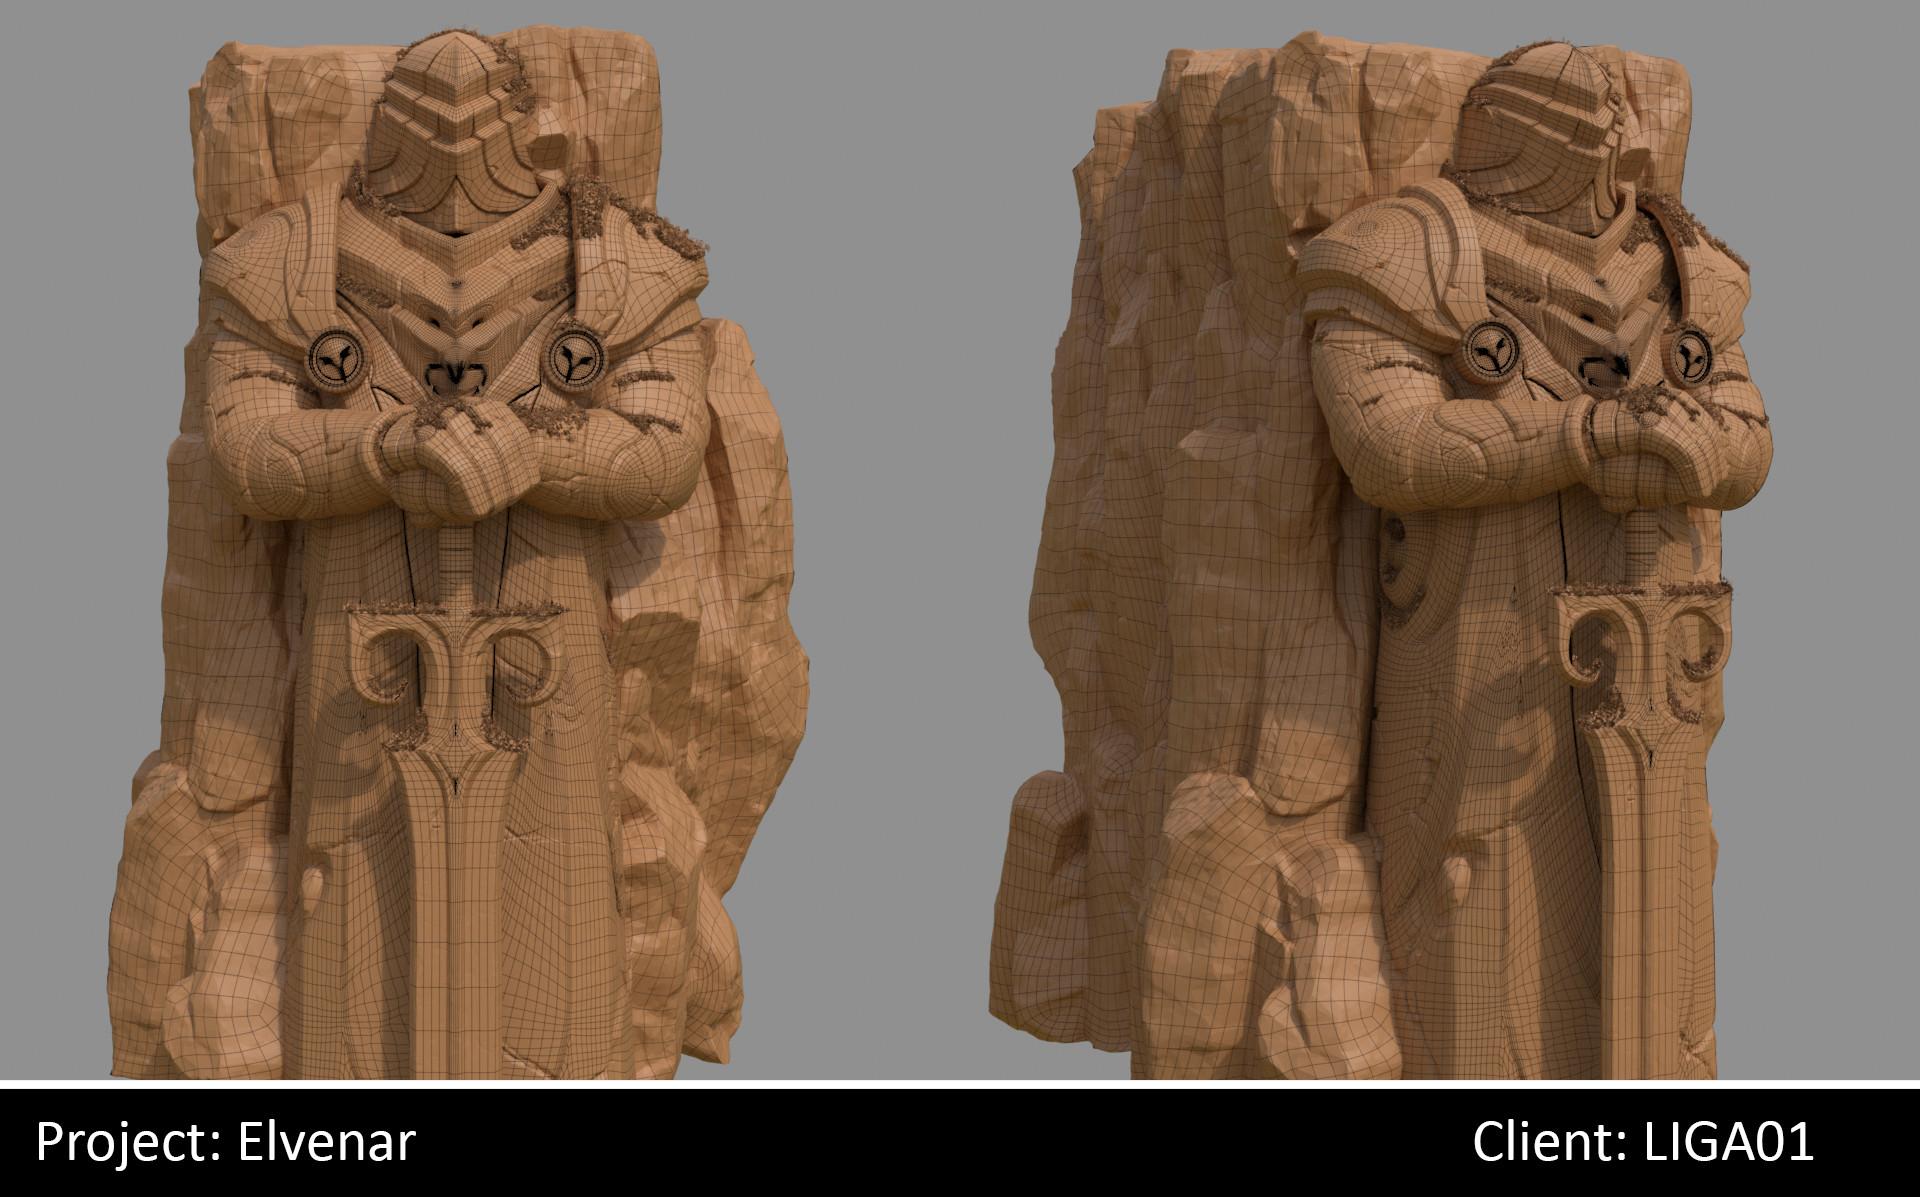 Darko mitev statue01 wireframe